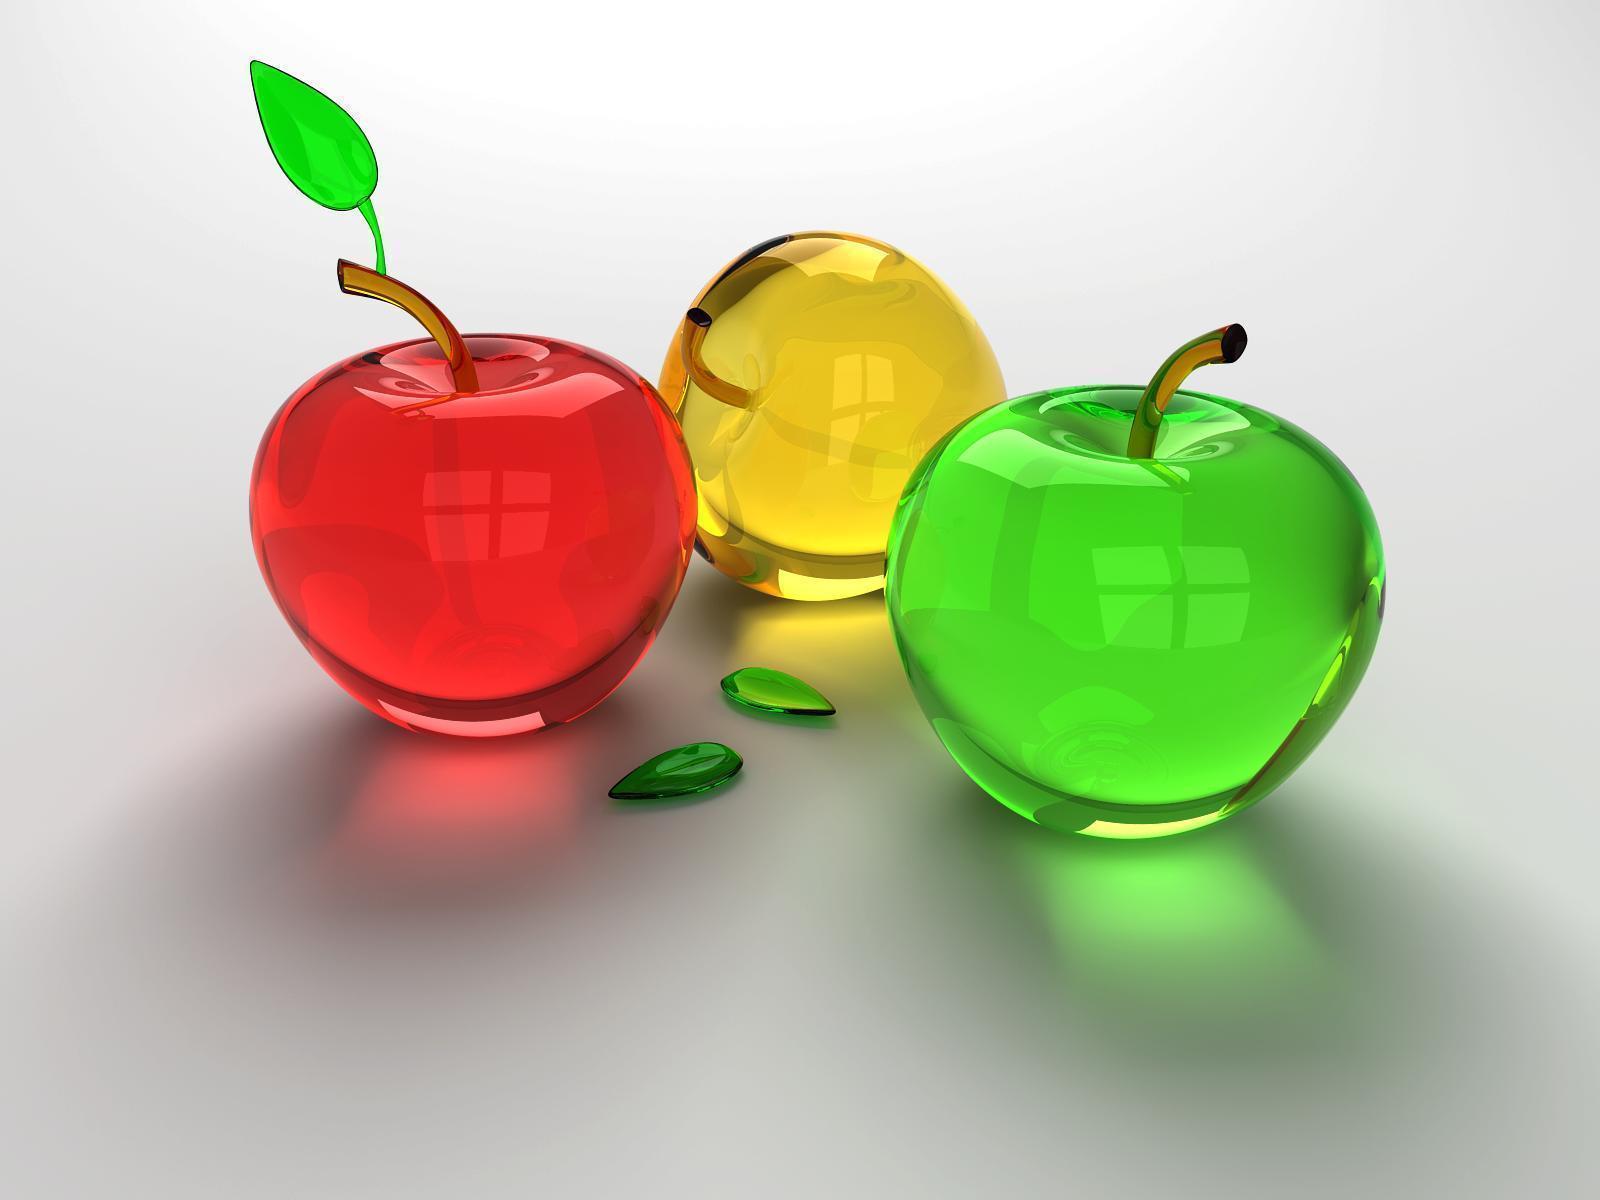 Apple fruit images download - Glass Apples Wallpaper Fruit Wallpaper 2500605 Fanpop